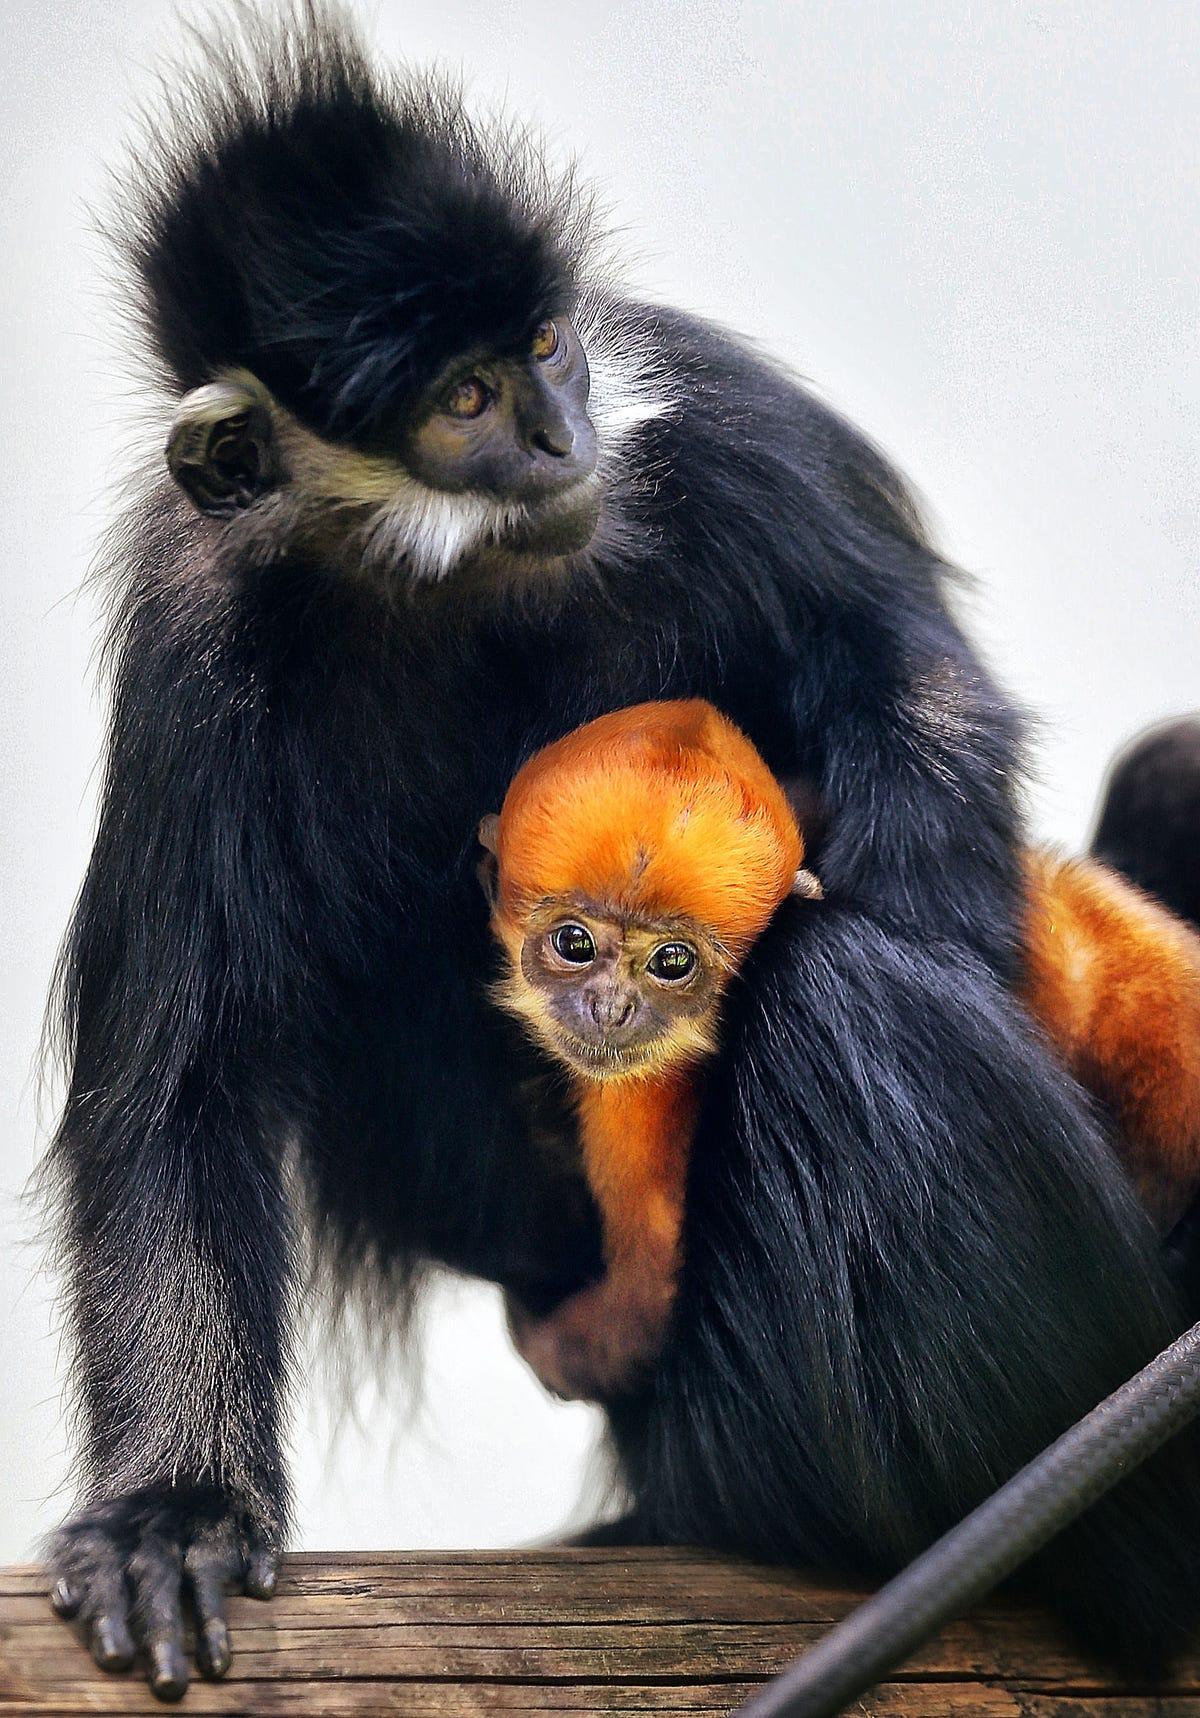 Record-breaking' birth at Memphis Zoo